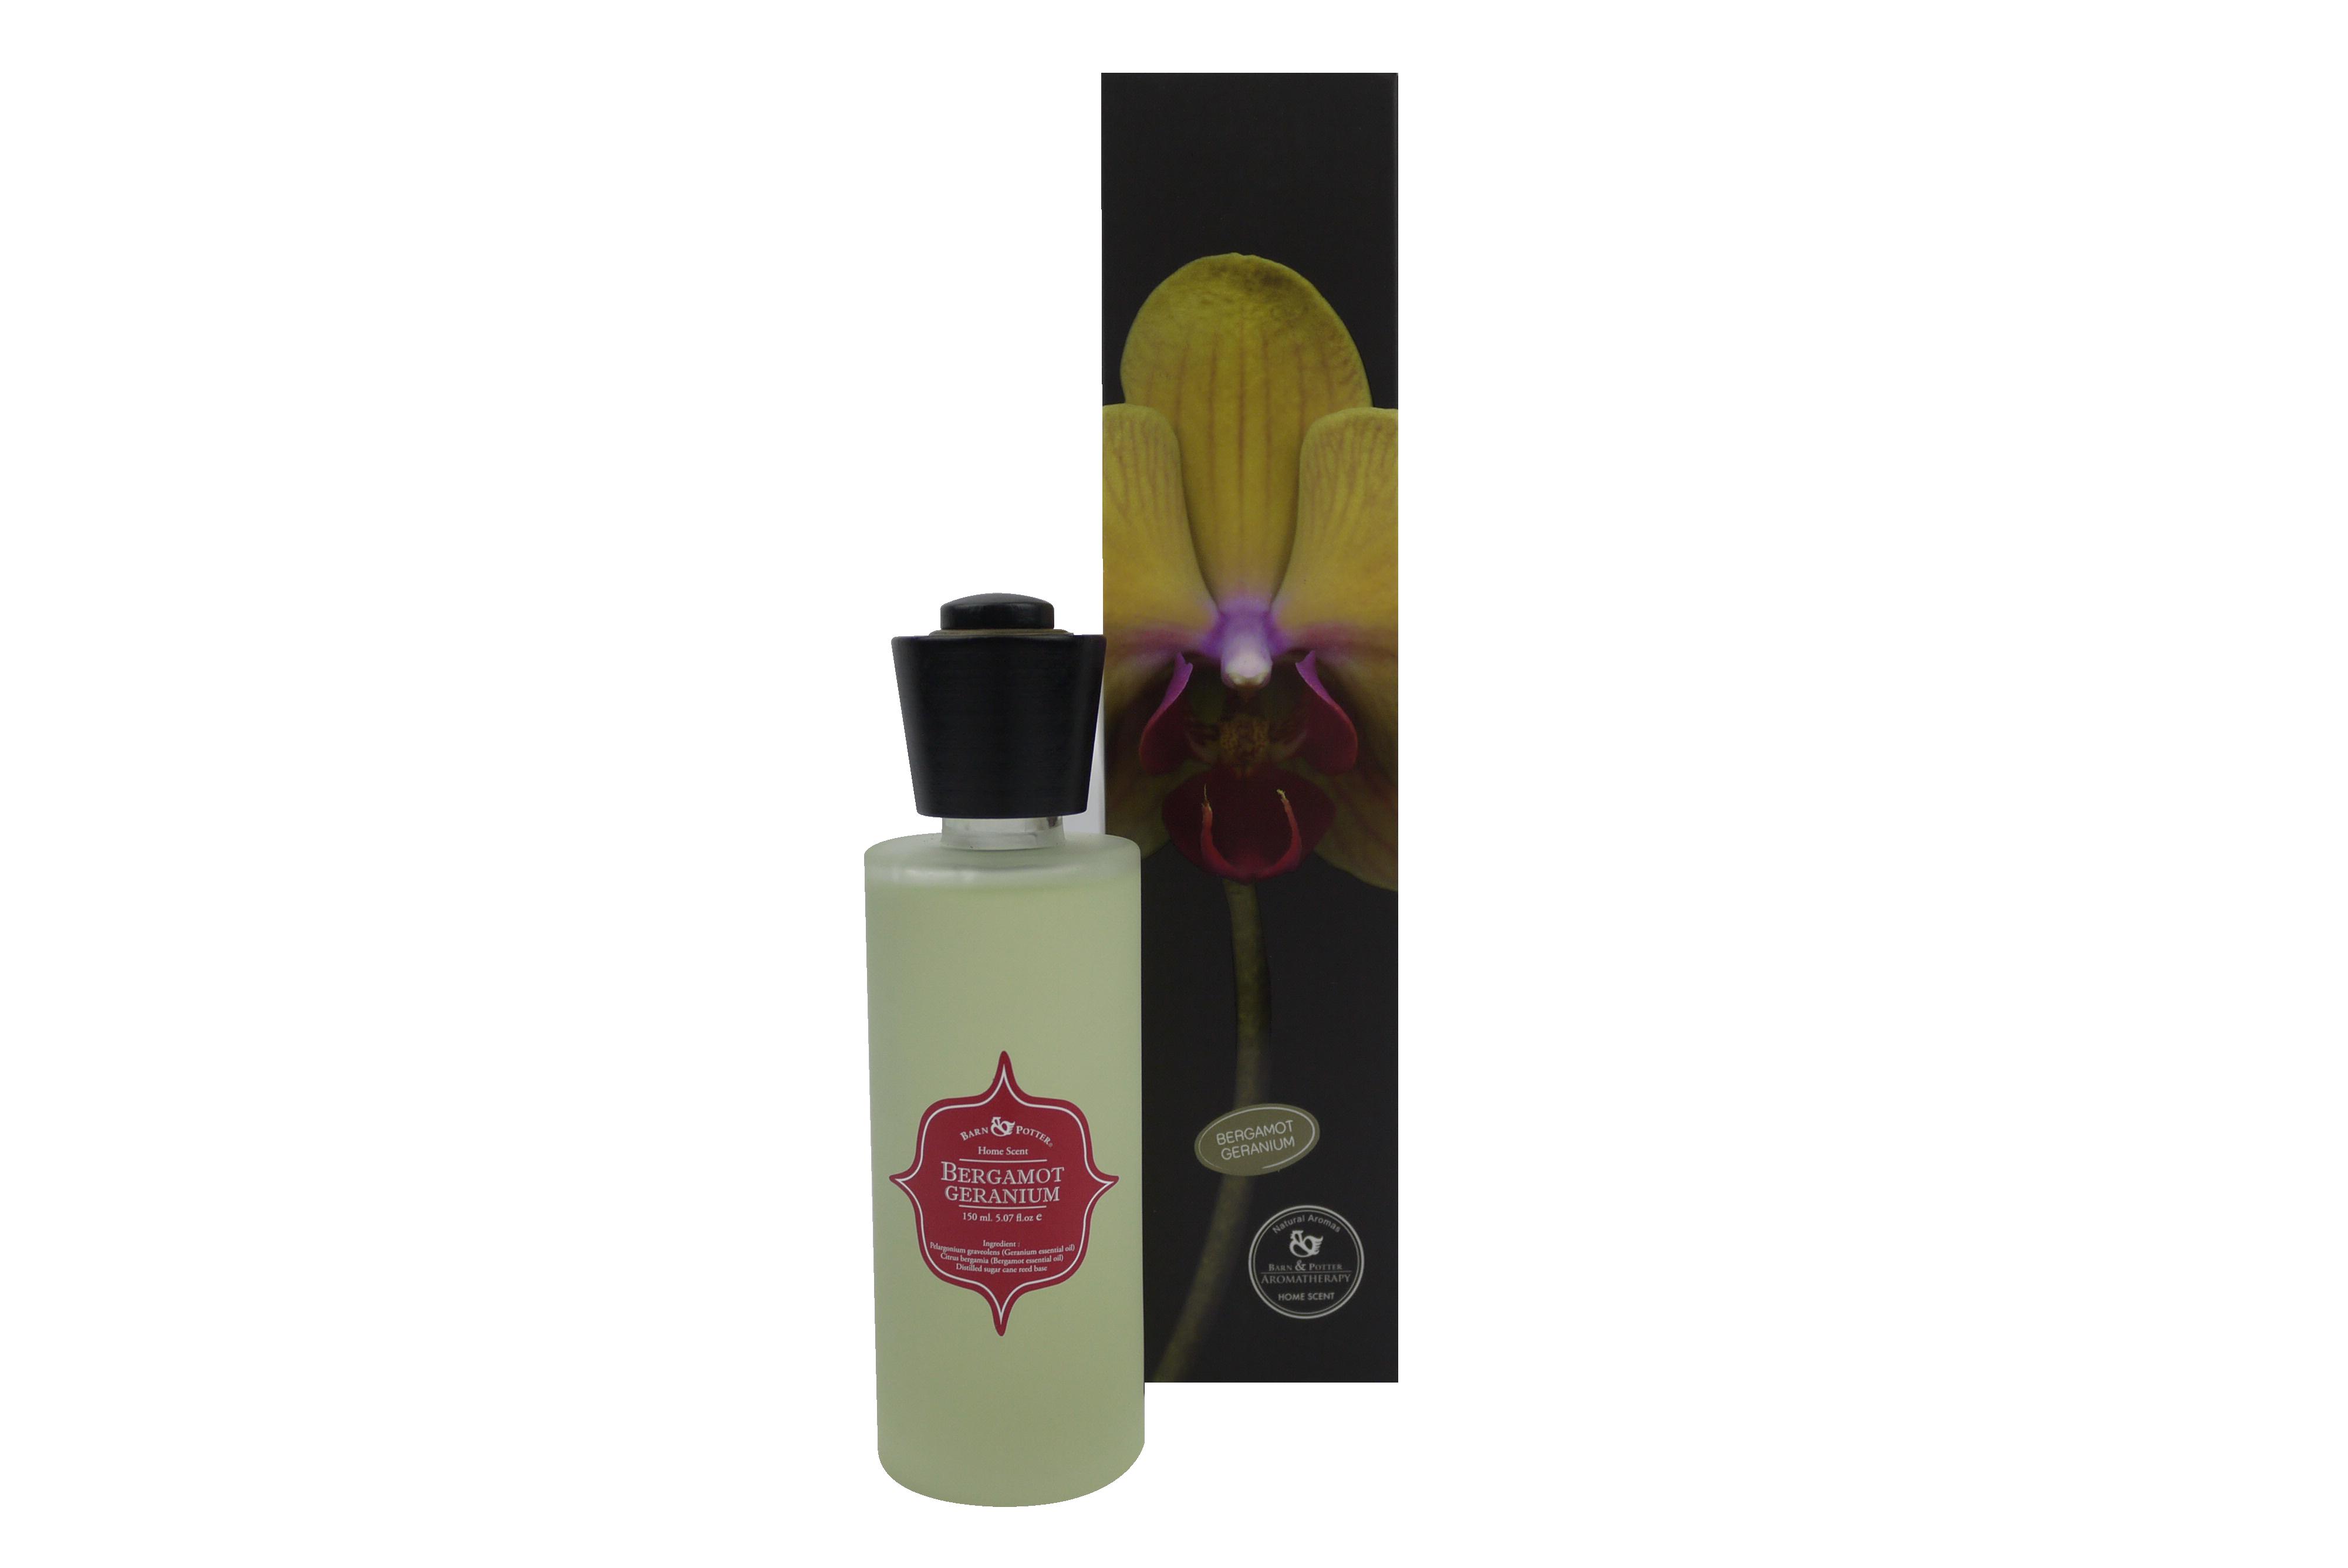 mts-home-scent-bergamot-geranium-150ml